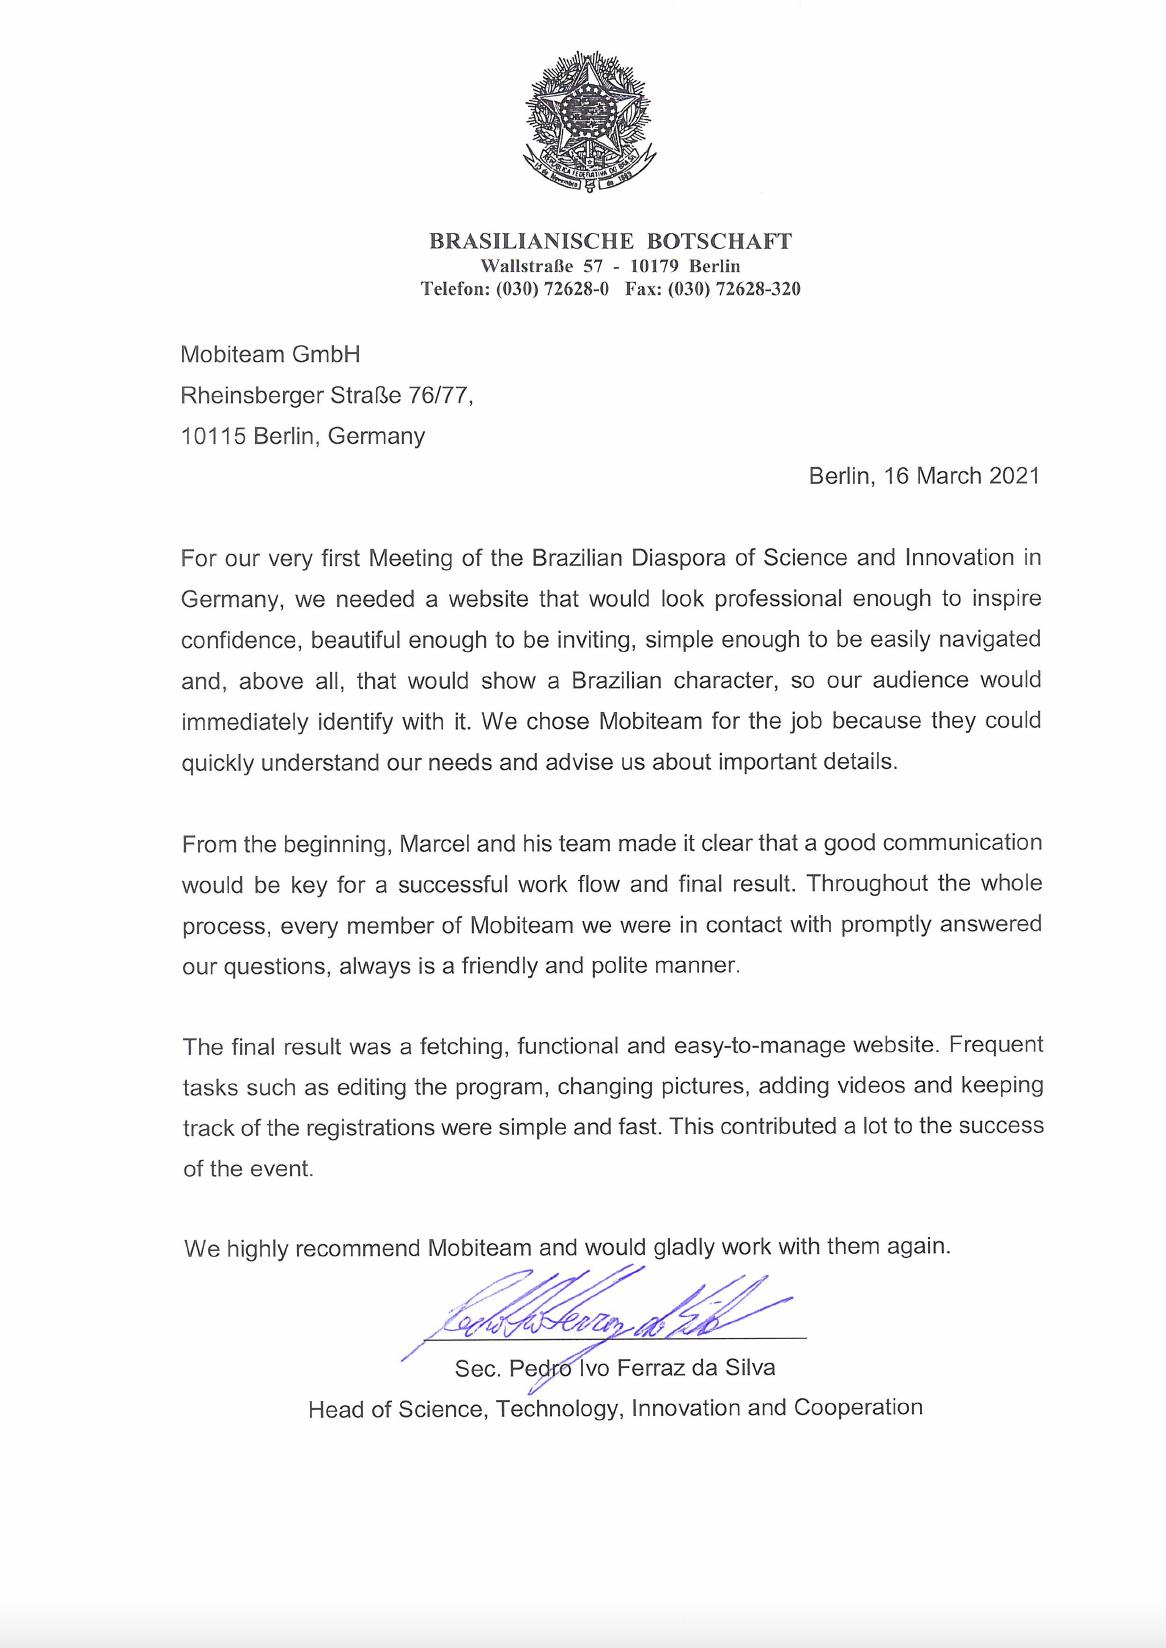 recommendation_letter_mobiteam_embassy_of_brazil-2